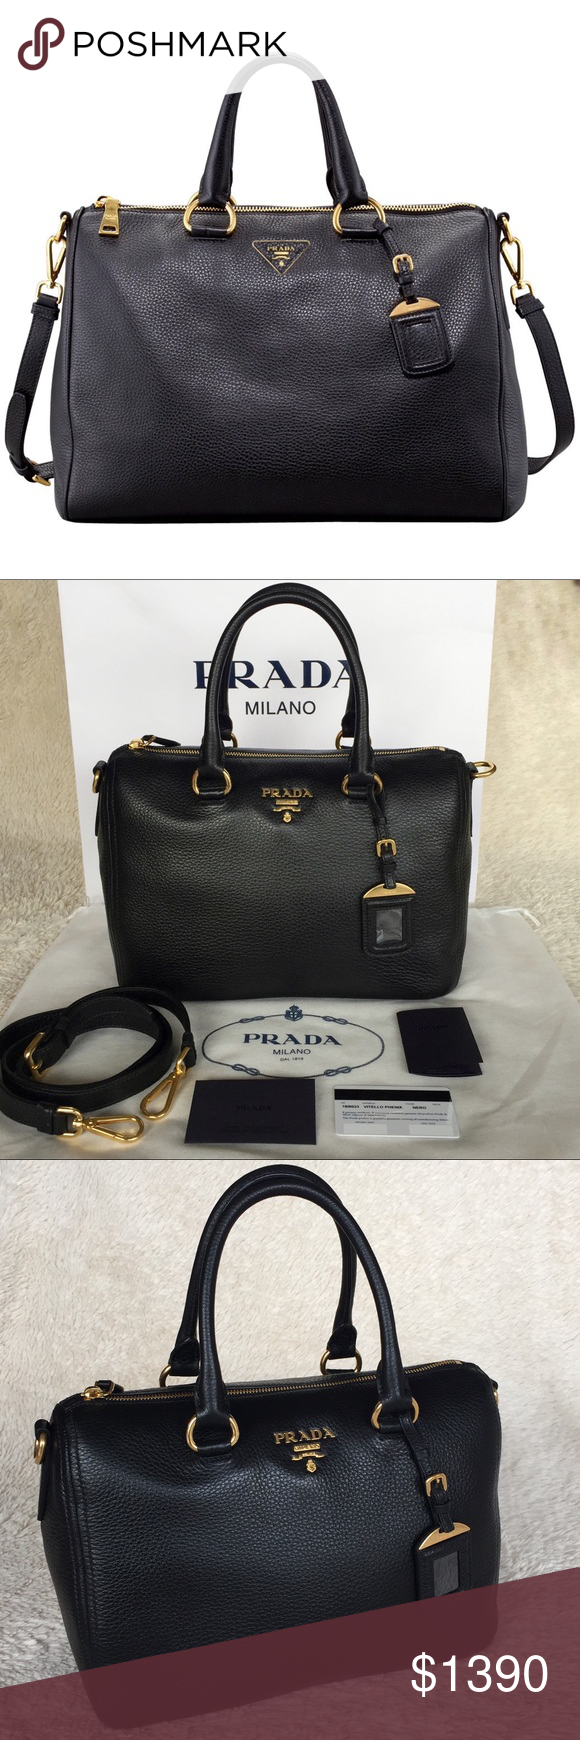 9c61e5164e ... inexpensive new prada vitello phenix bauletto 1bb023 authentic. brand  new with tags. this bag ...